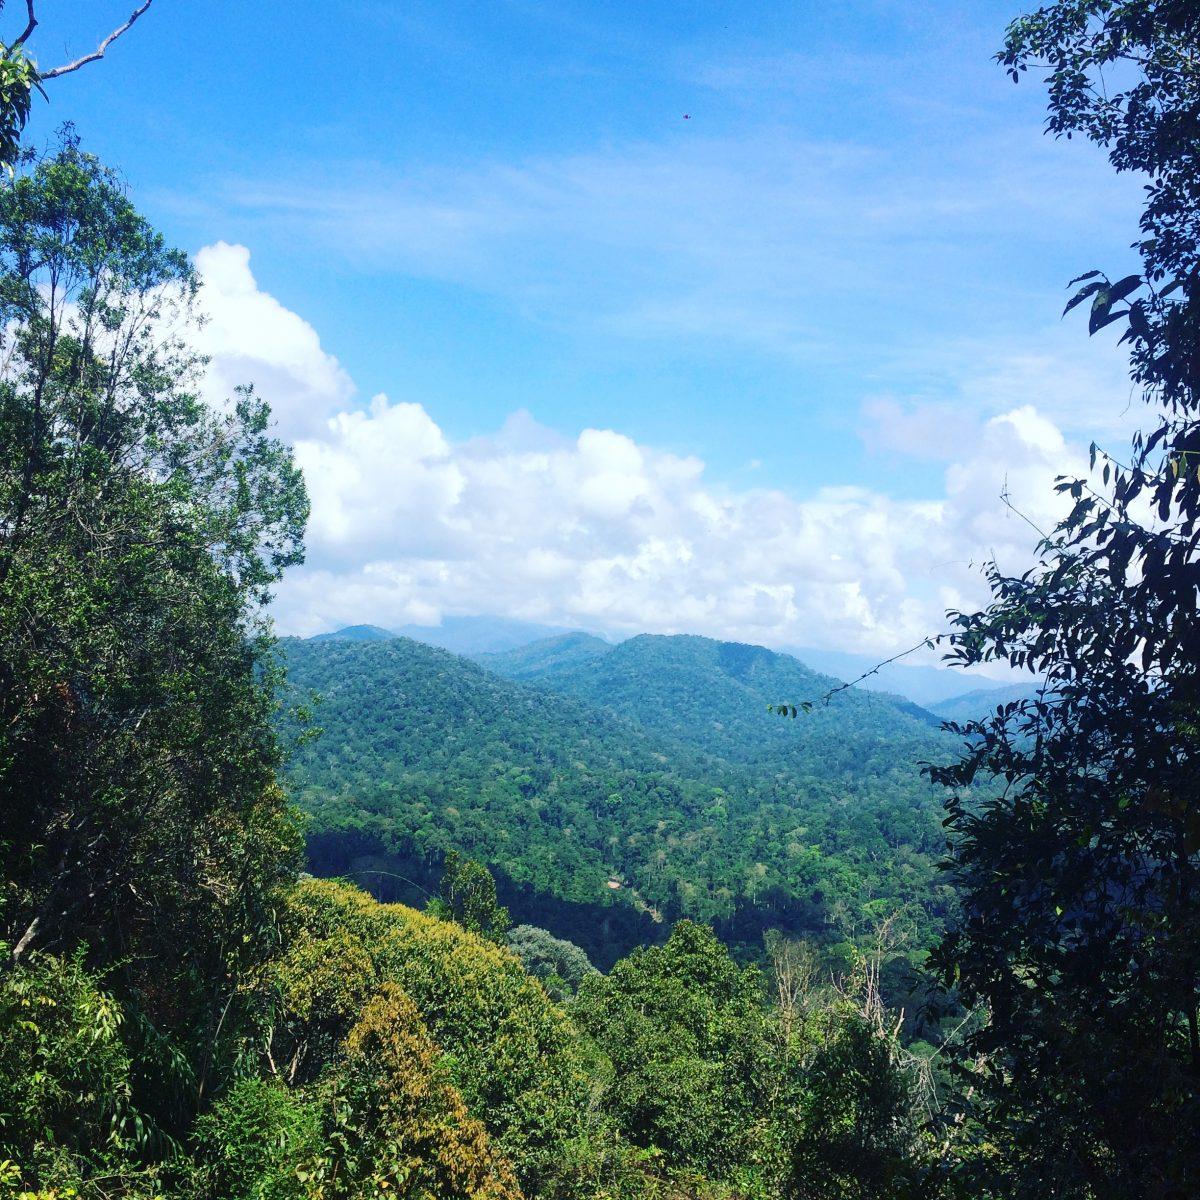 Negara Park, Malezja